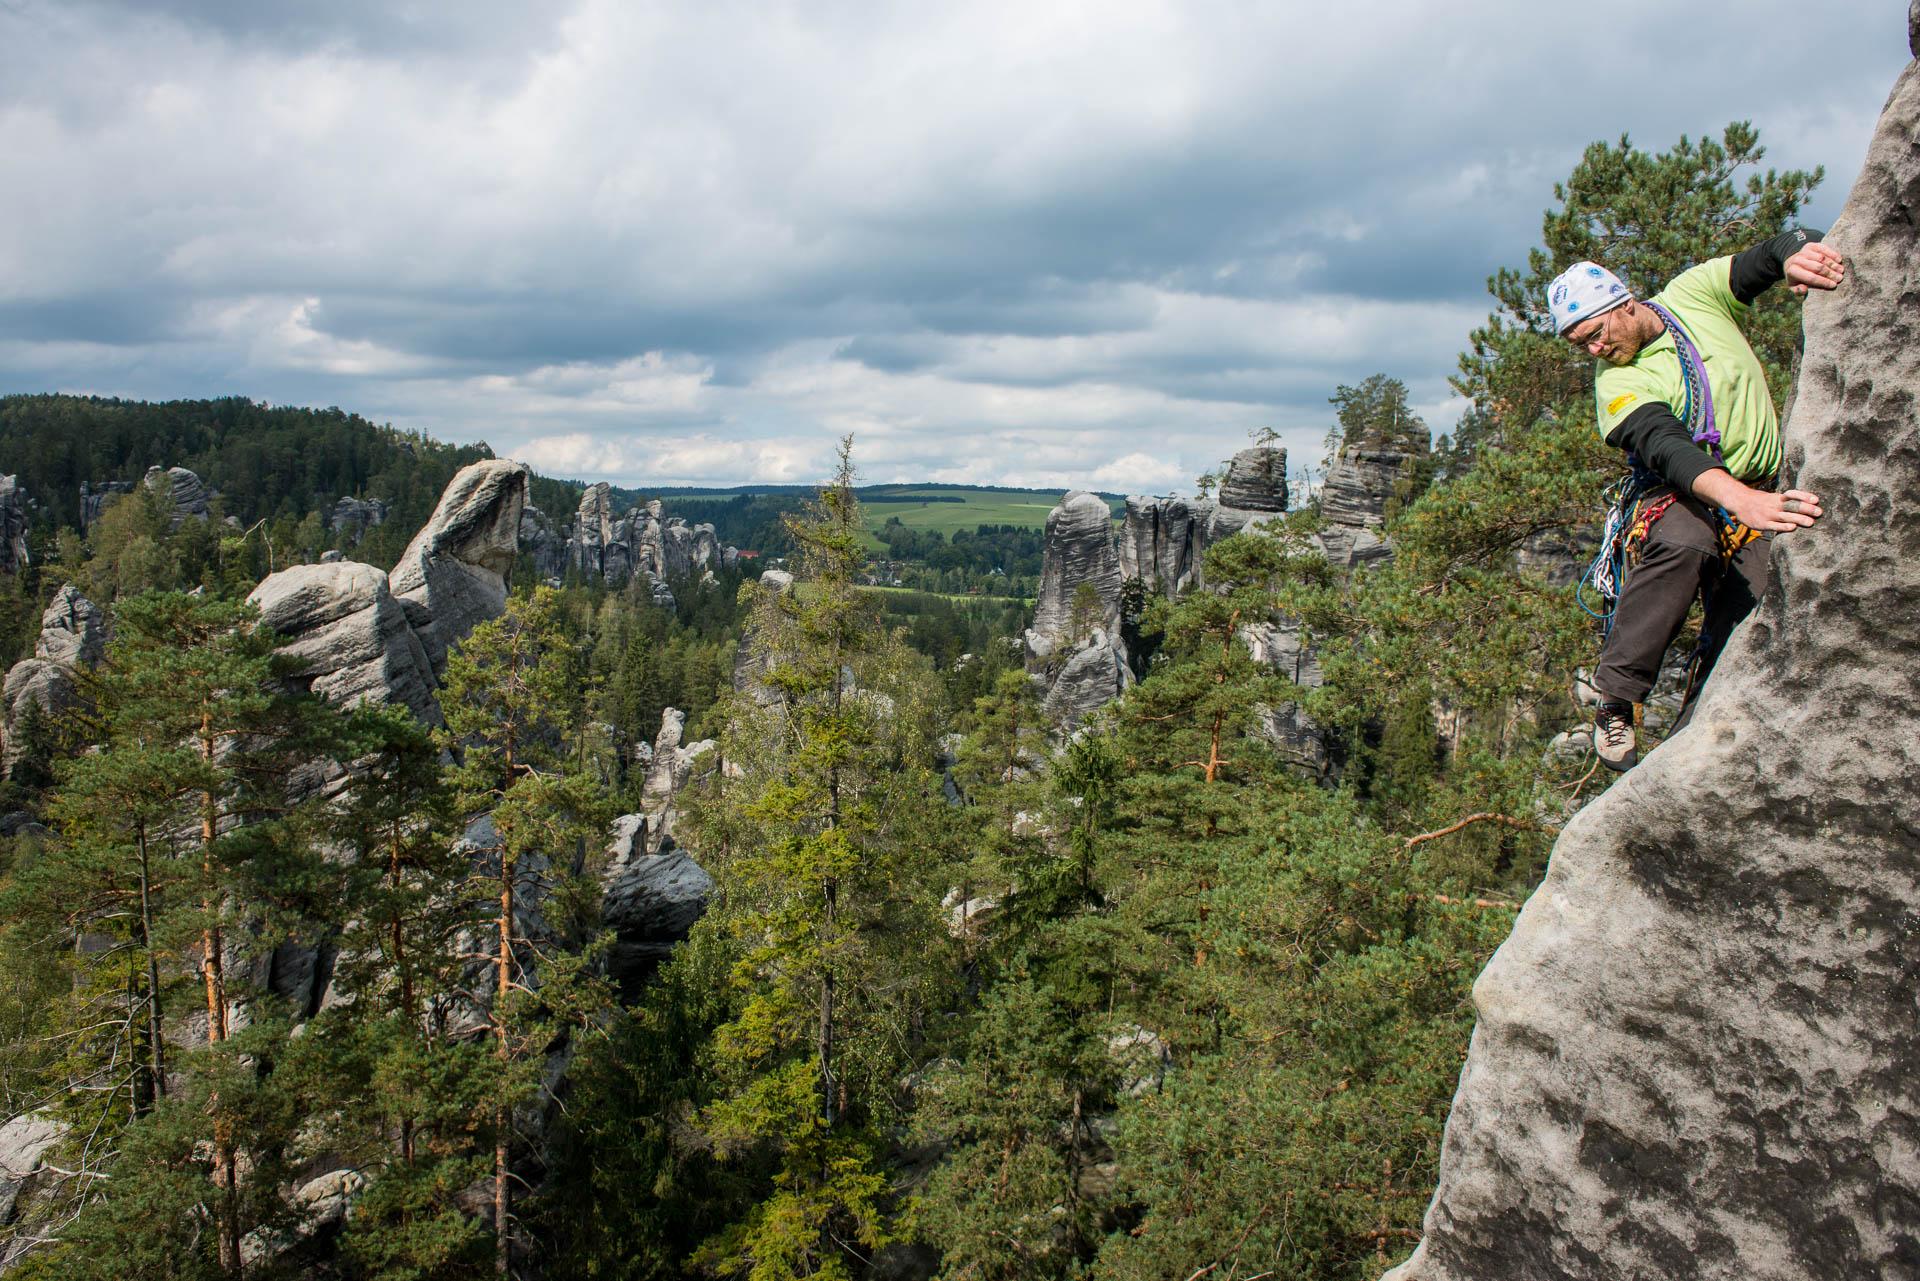 Adrspach Tsjechië klimmen, publicatie BLOK Blad Over Klimmen, Frank Penders fotograaf